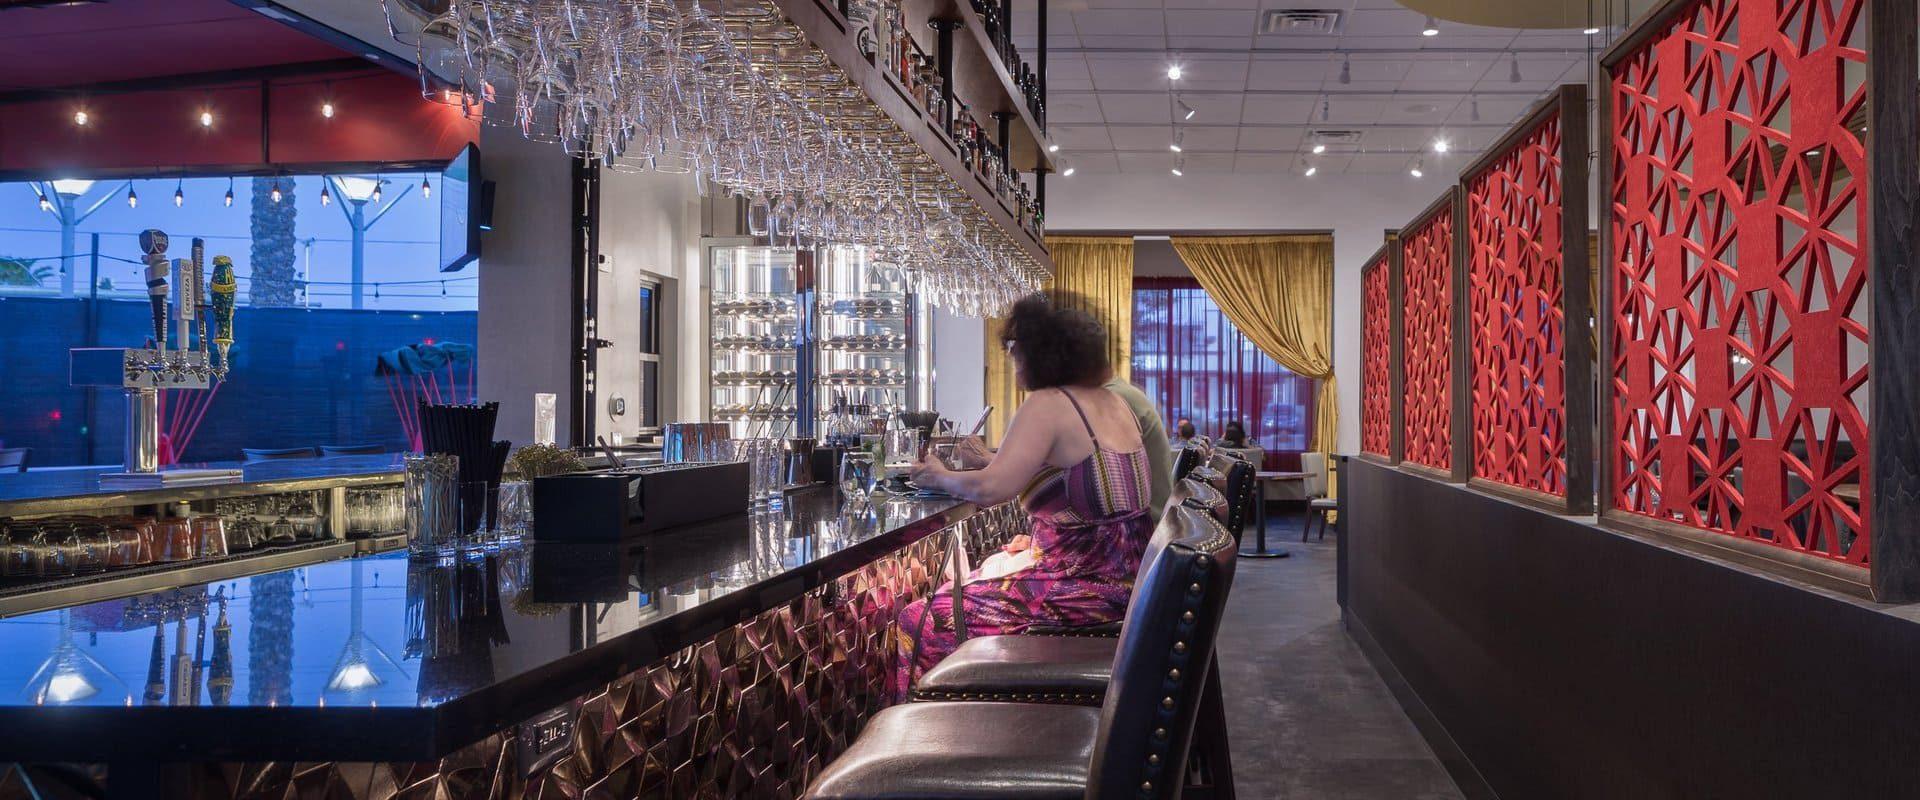 The bar inside Chinglish, a Cantonese restaurant in Las Vegas, NV.